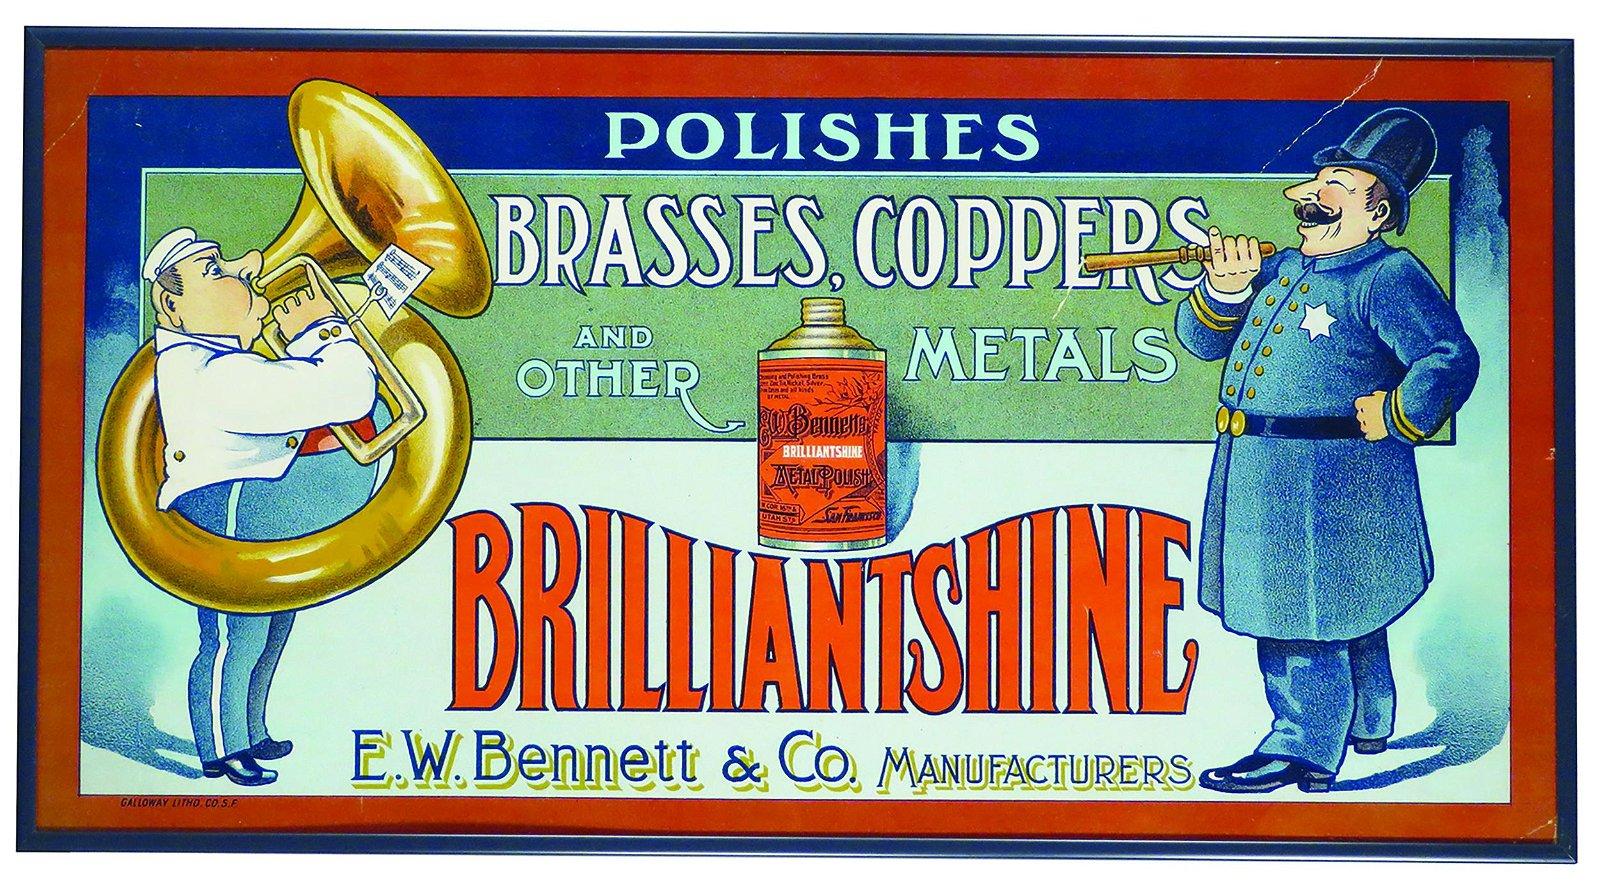 Two Brilliantshine Trolley Car Advertising Signs